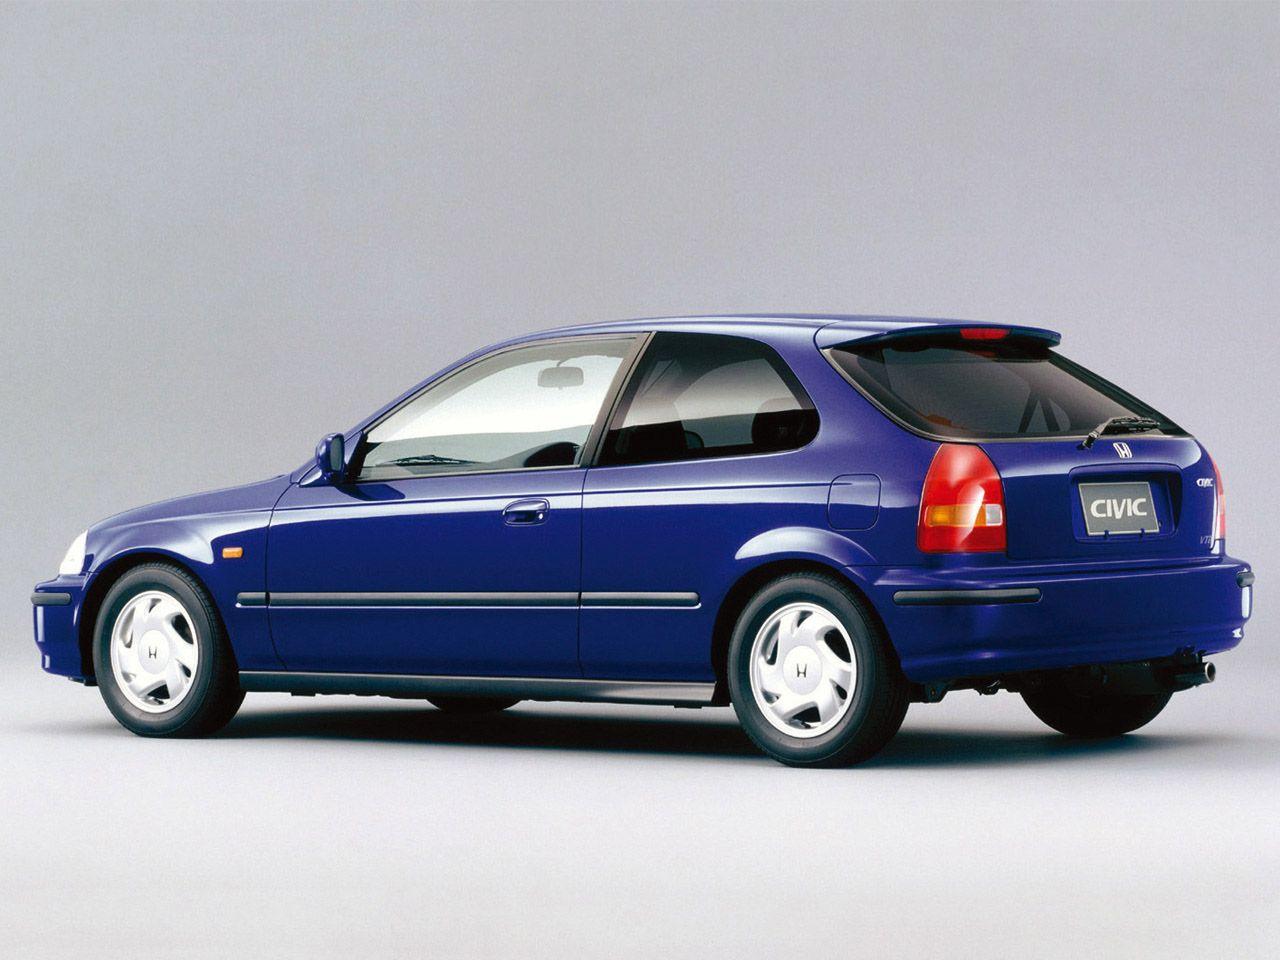 1995 Honda Civic VTi | Stuff to Try | Pinterest | Honda civic, Honda